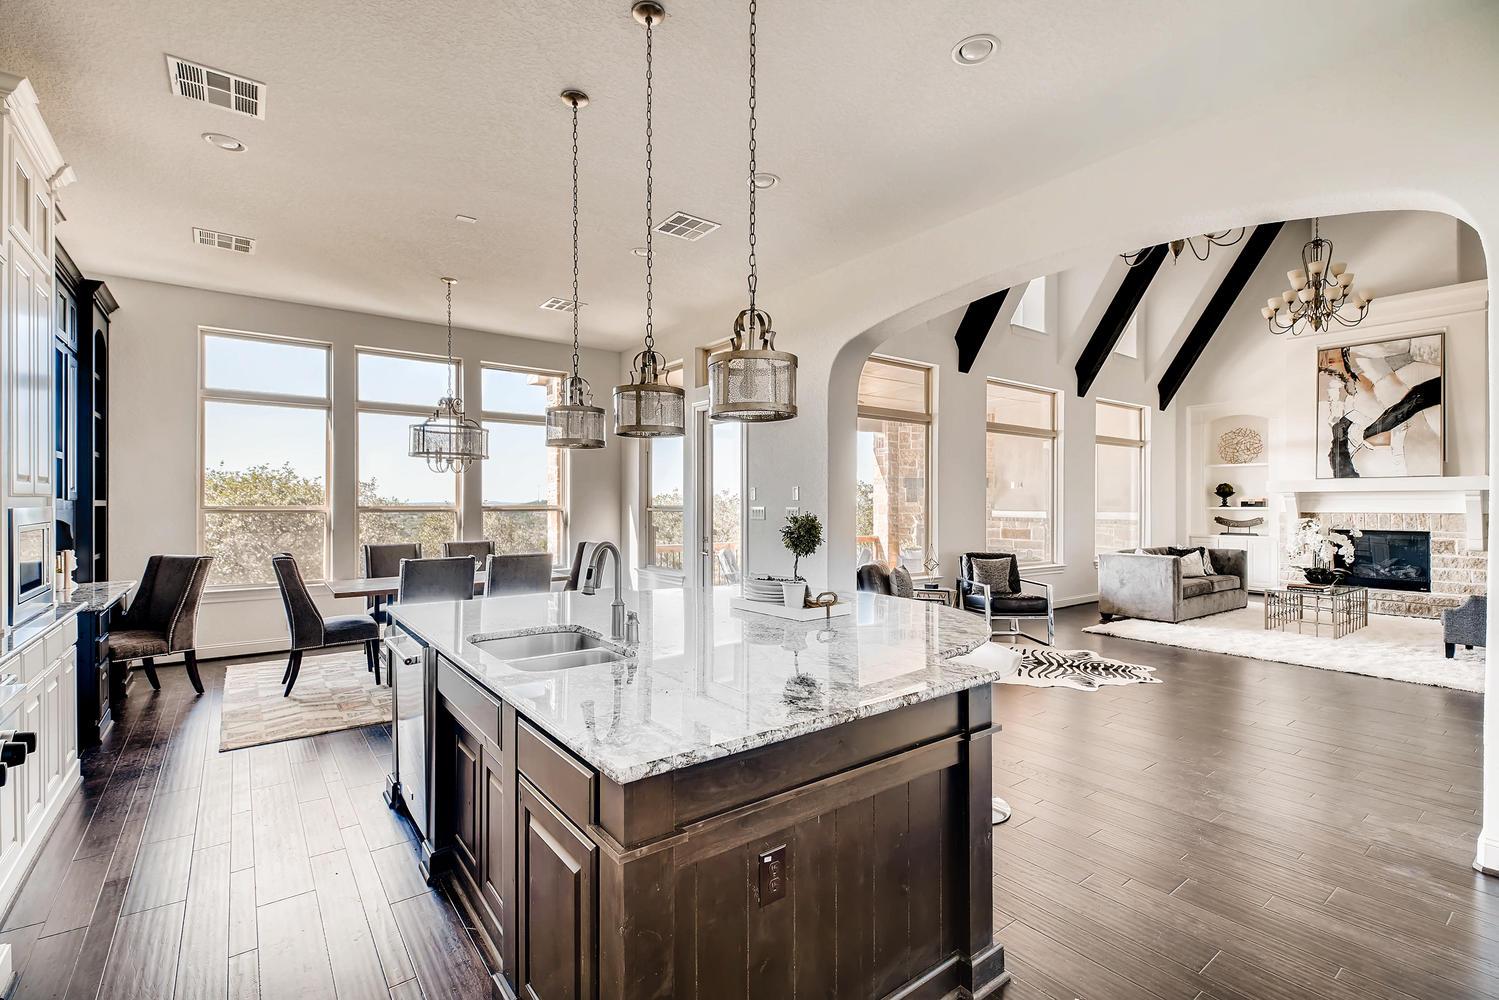 7847 Vanity Hill San Antonio-large-012-13-Kitchen-1500x1000-72dpi.jpg